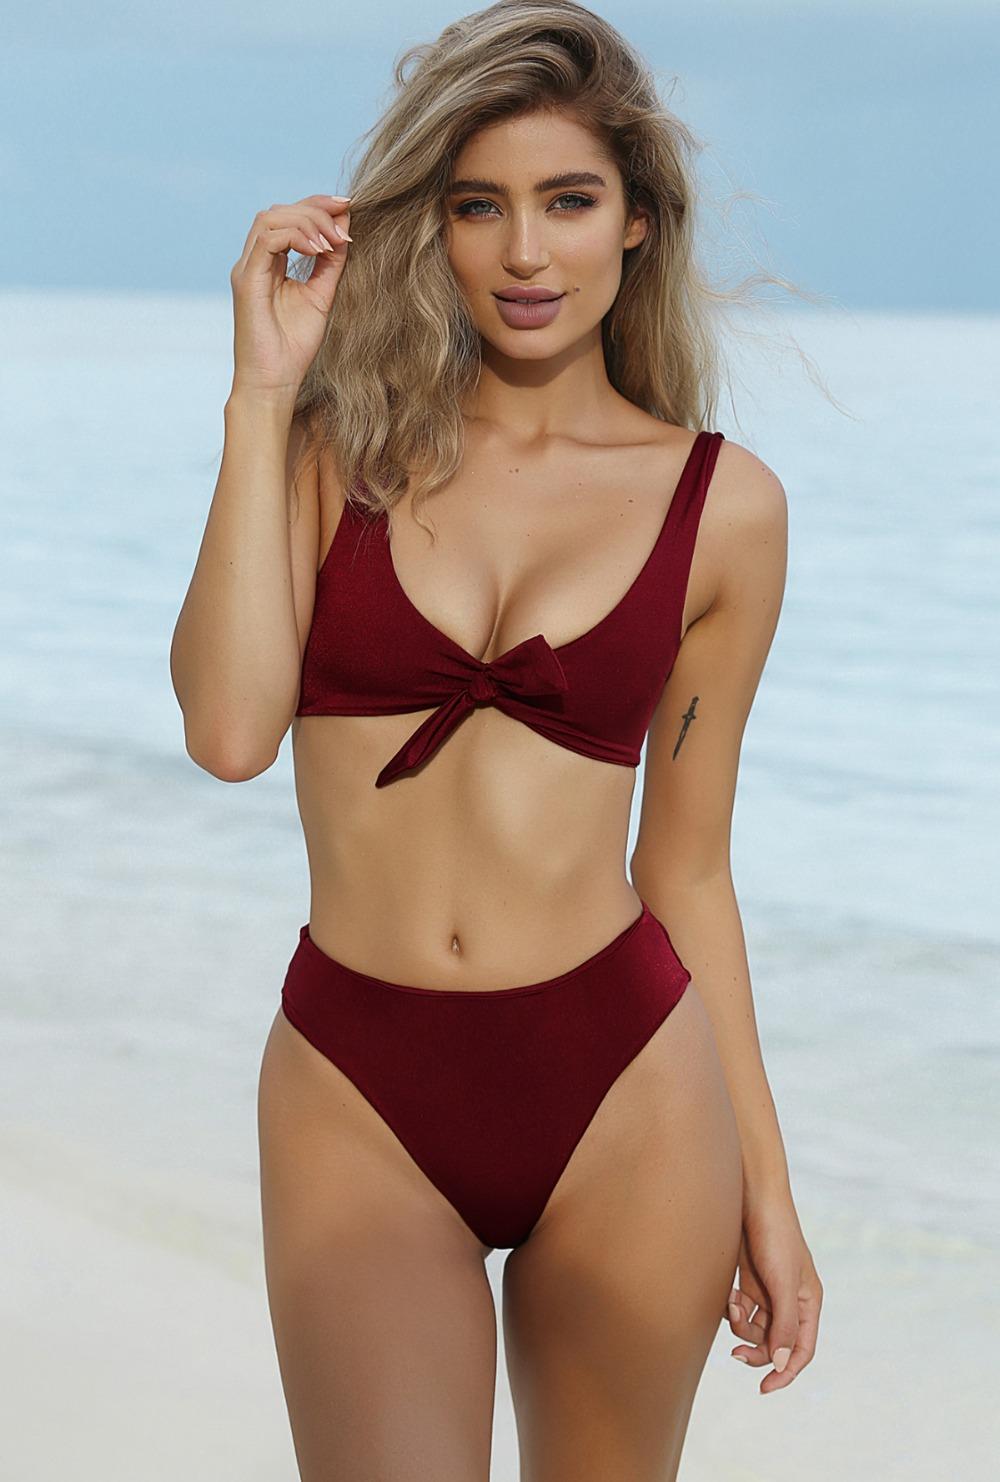 HTB1nfi1RVXXXXaHXVXXq6xXFXXXd - Summer sexy Beach Bikini Double wrapped chest Women Beach swimsuit Underwear Bra sets JKP388